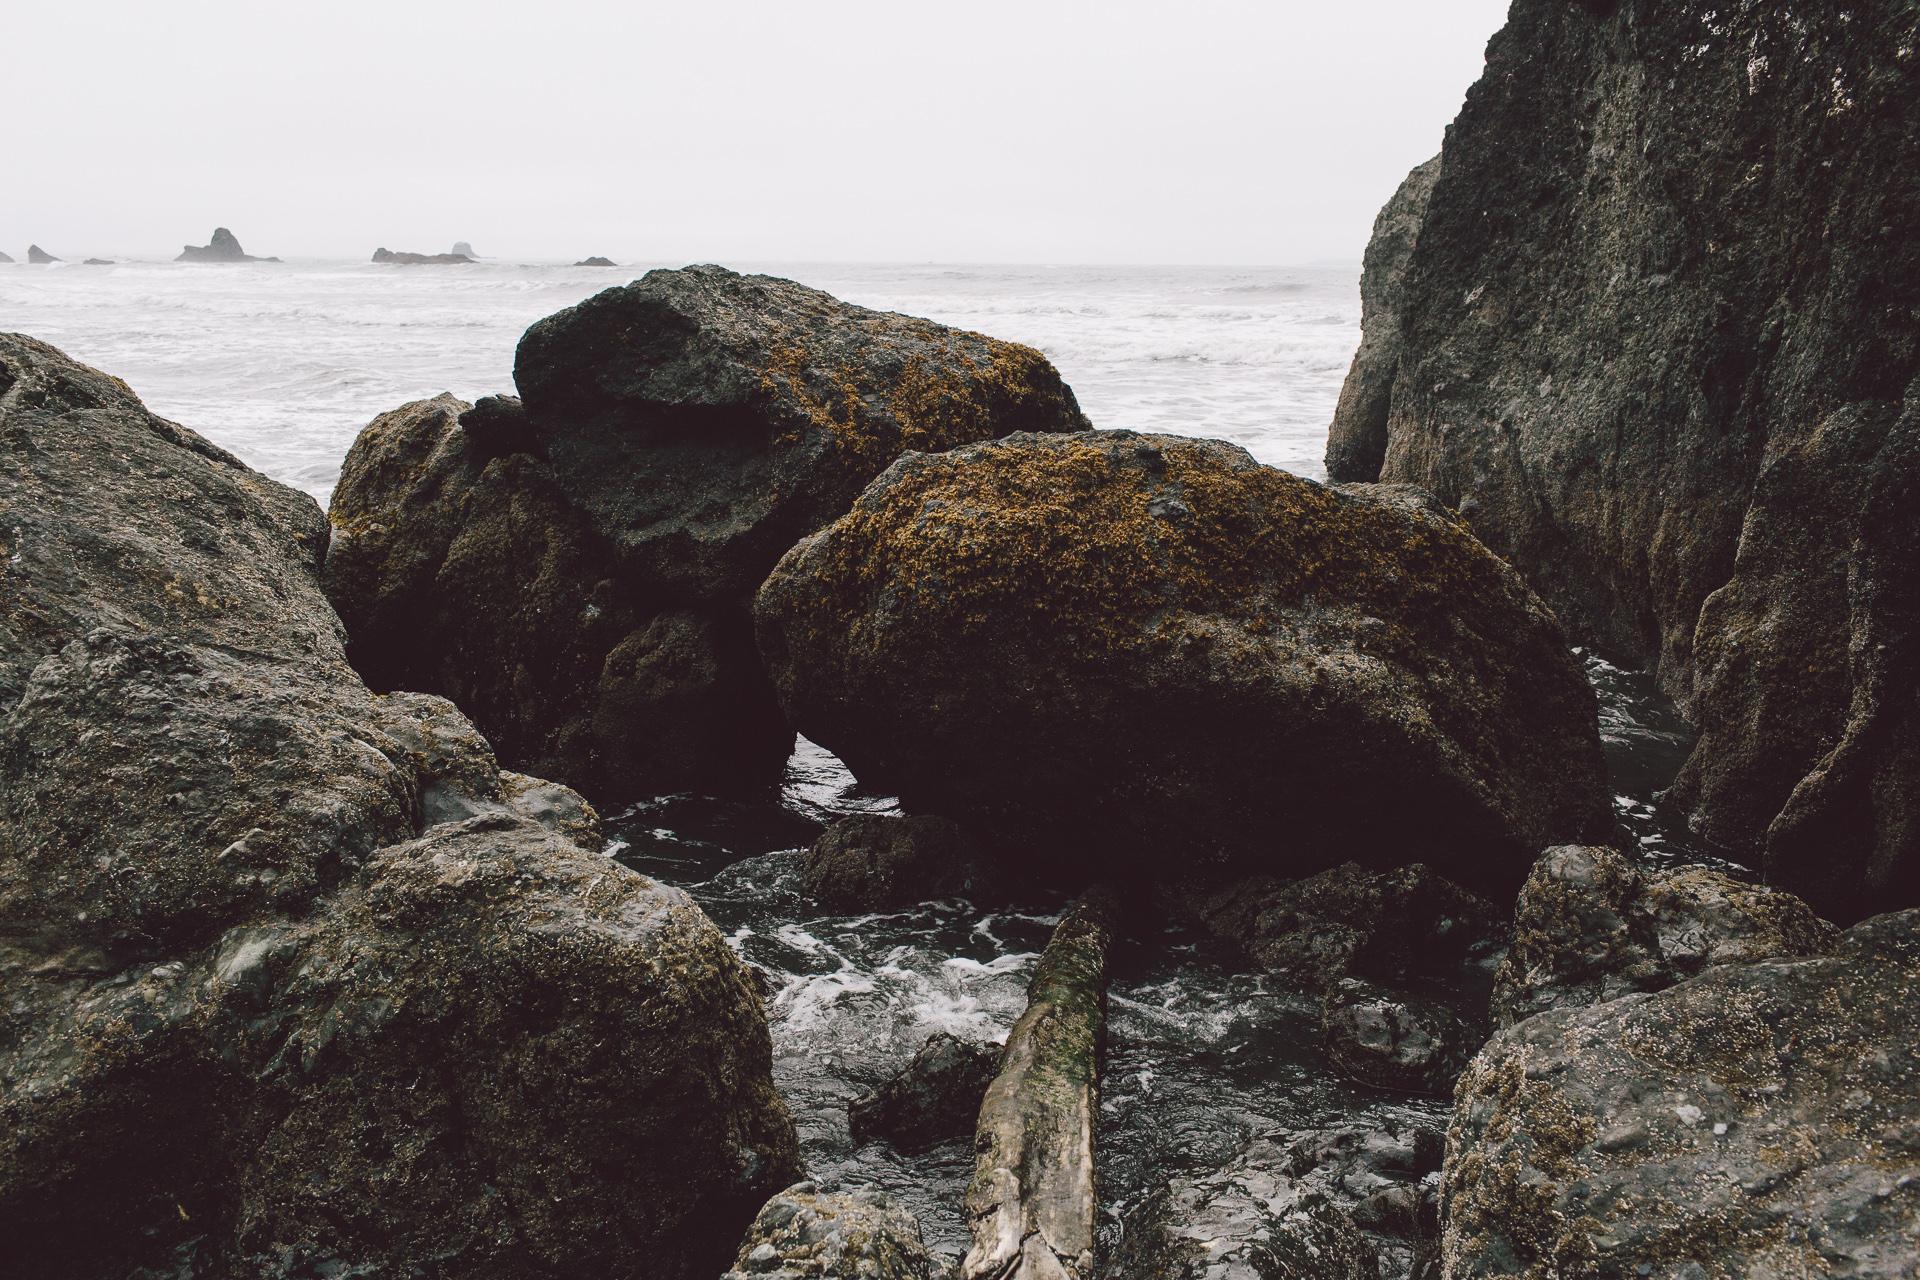 photography by Jess Hunter, Ruby Beach in Olympic National Park, Washington coast elopement location, Seattle intimate wedding photographer, explore Washington state, Olympic Peninsula travel photography, places to elope in the Olympic National forest, Pacific Northwest